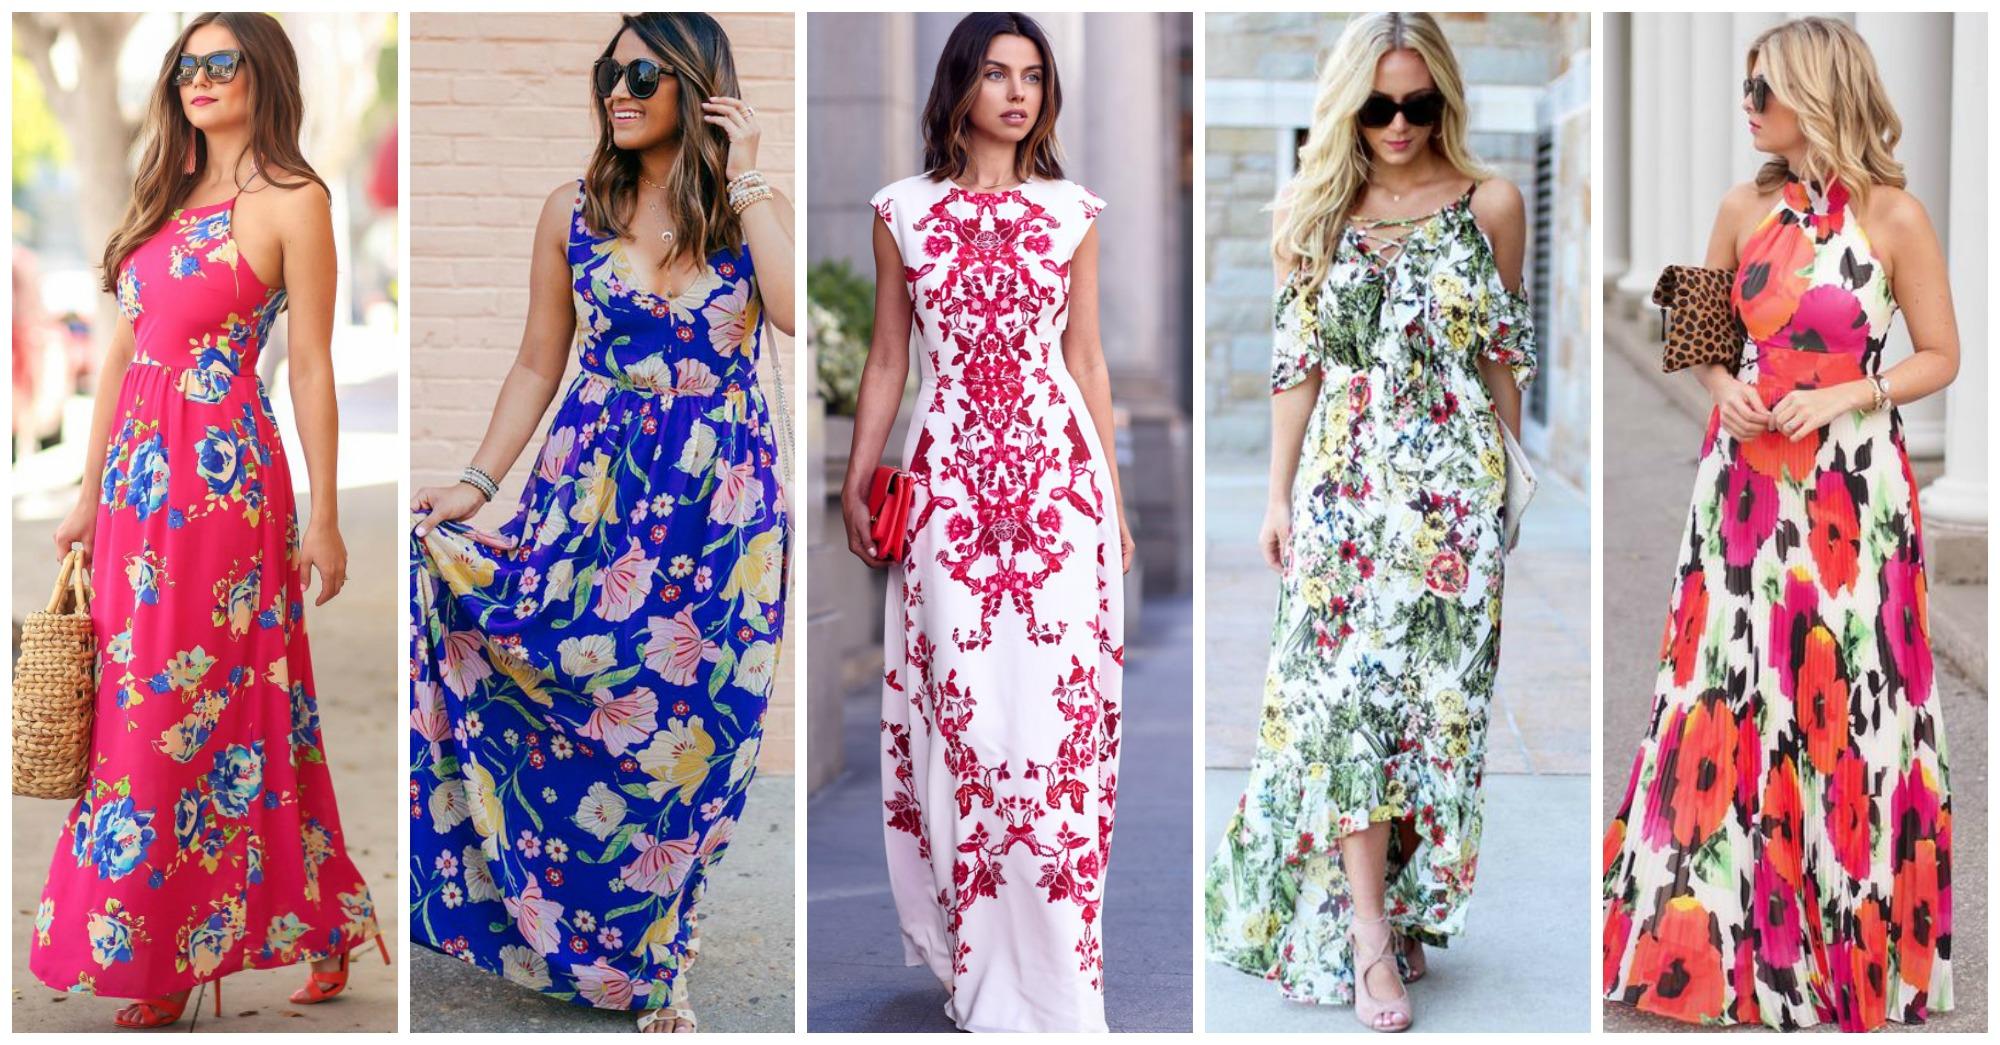 10 Fabulous Floral Maxi Dresses to Wear Now